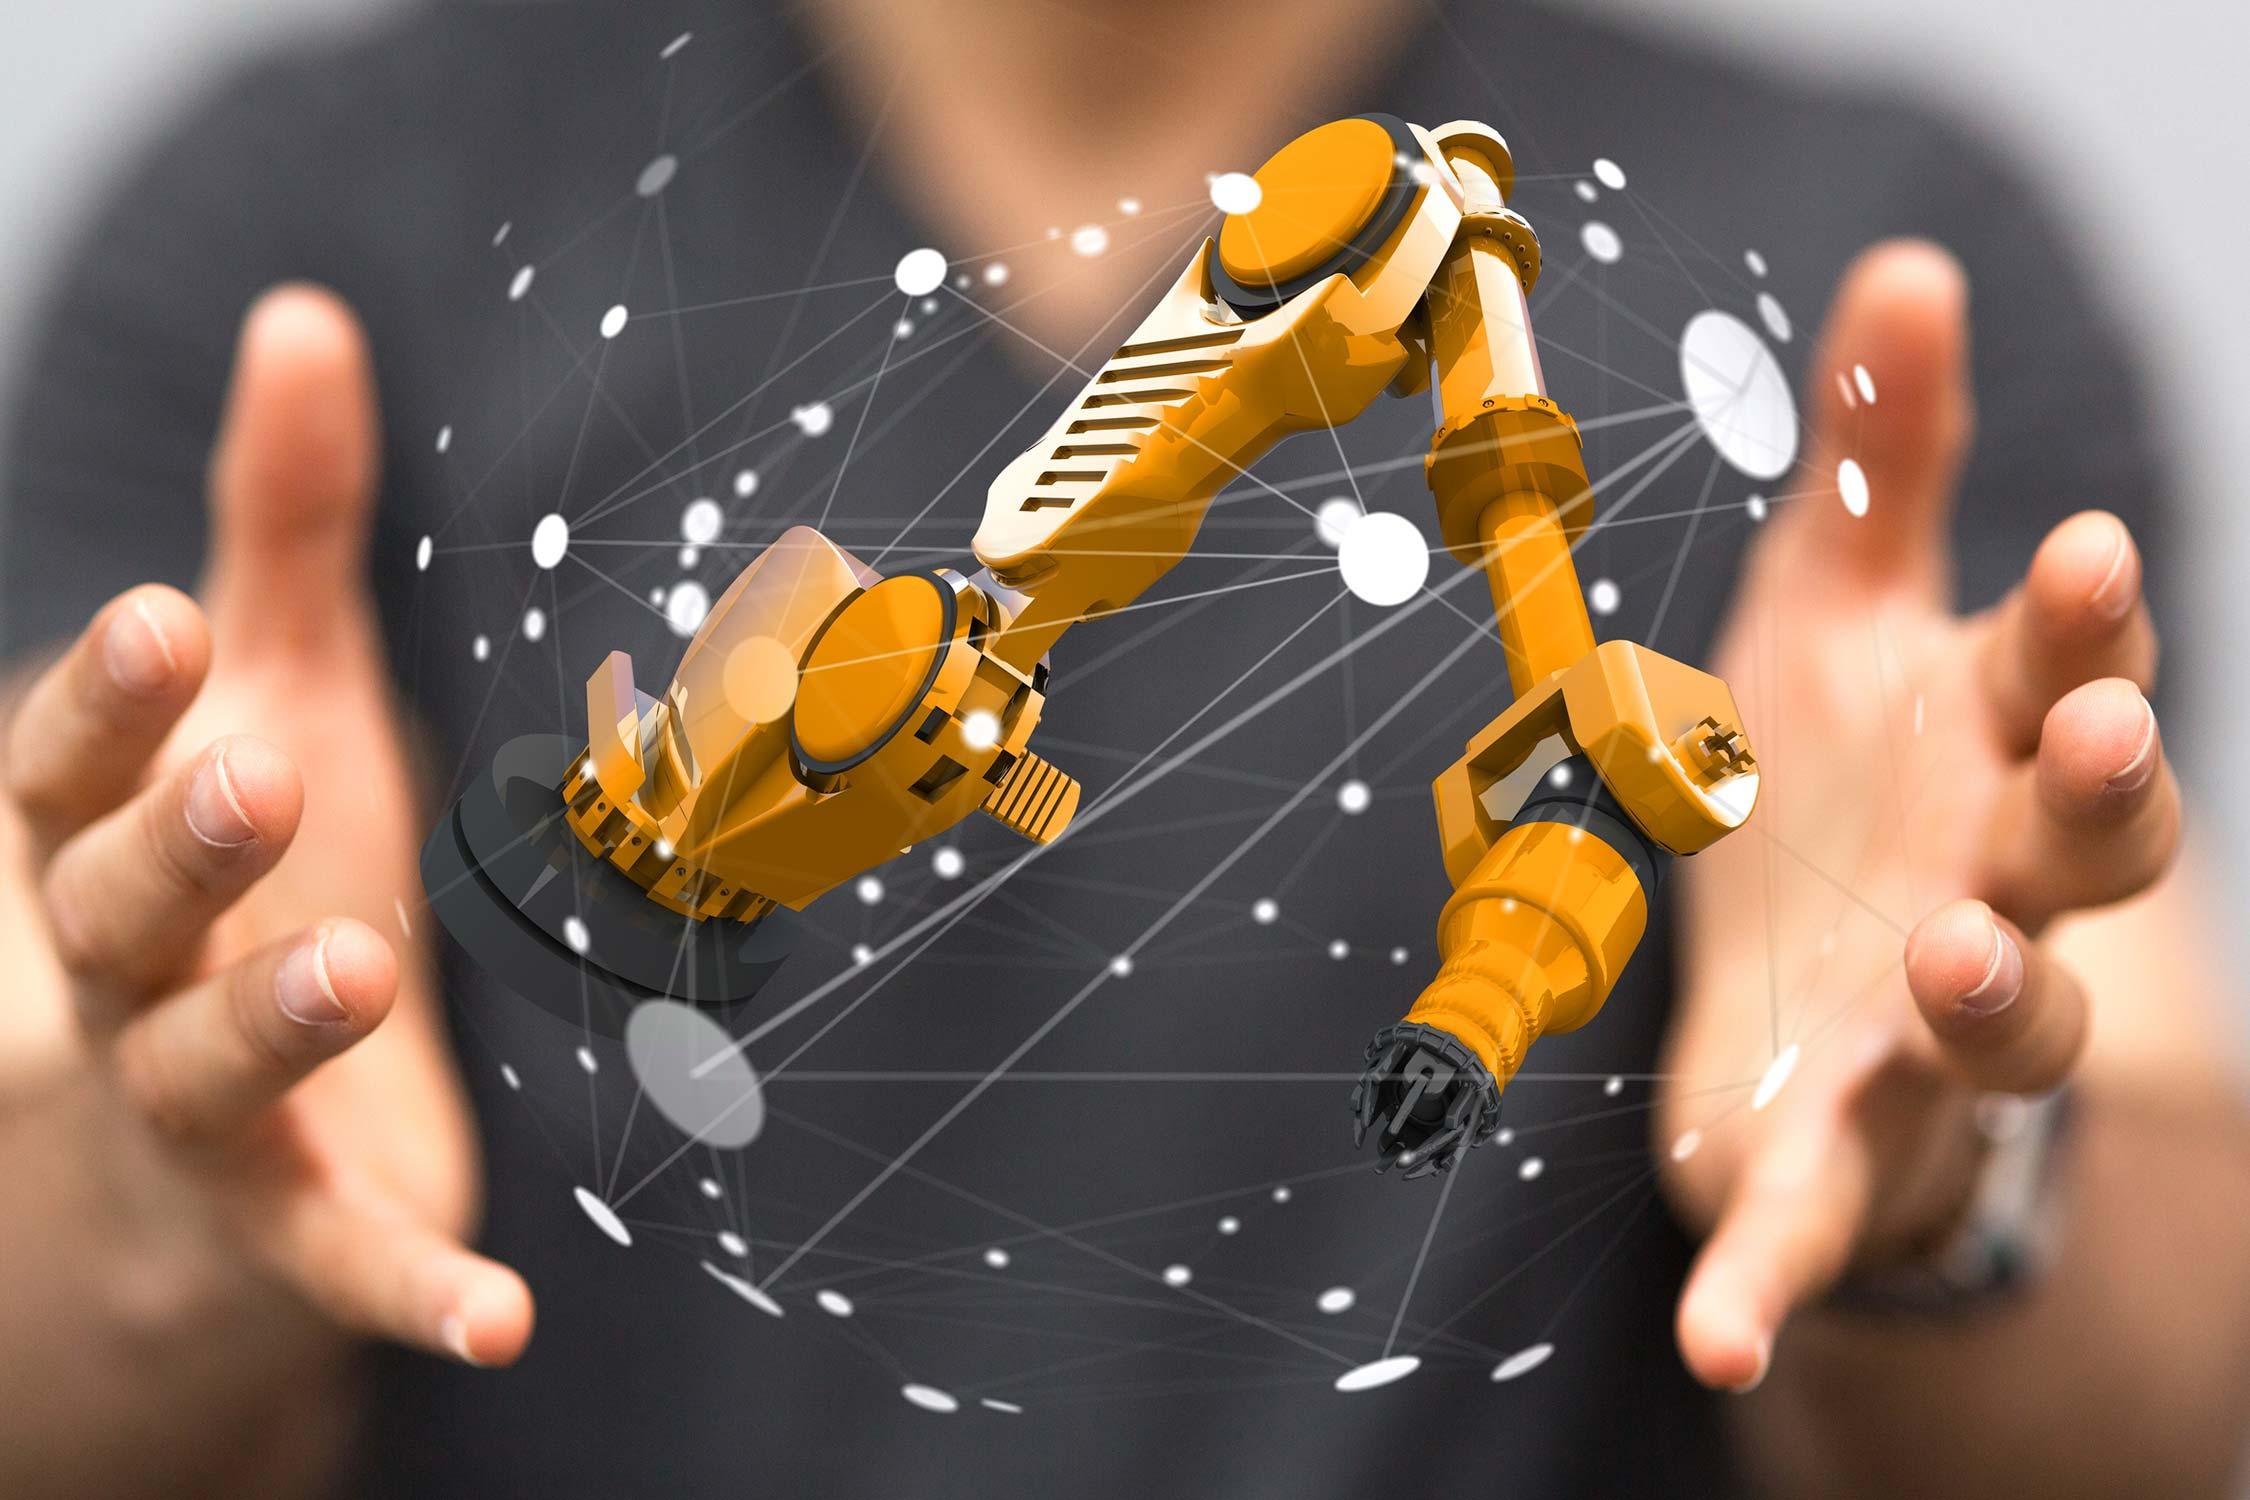 technologie-roboter